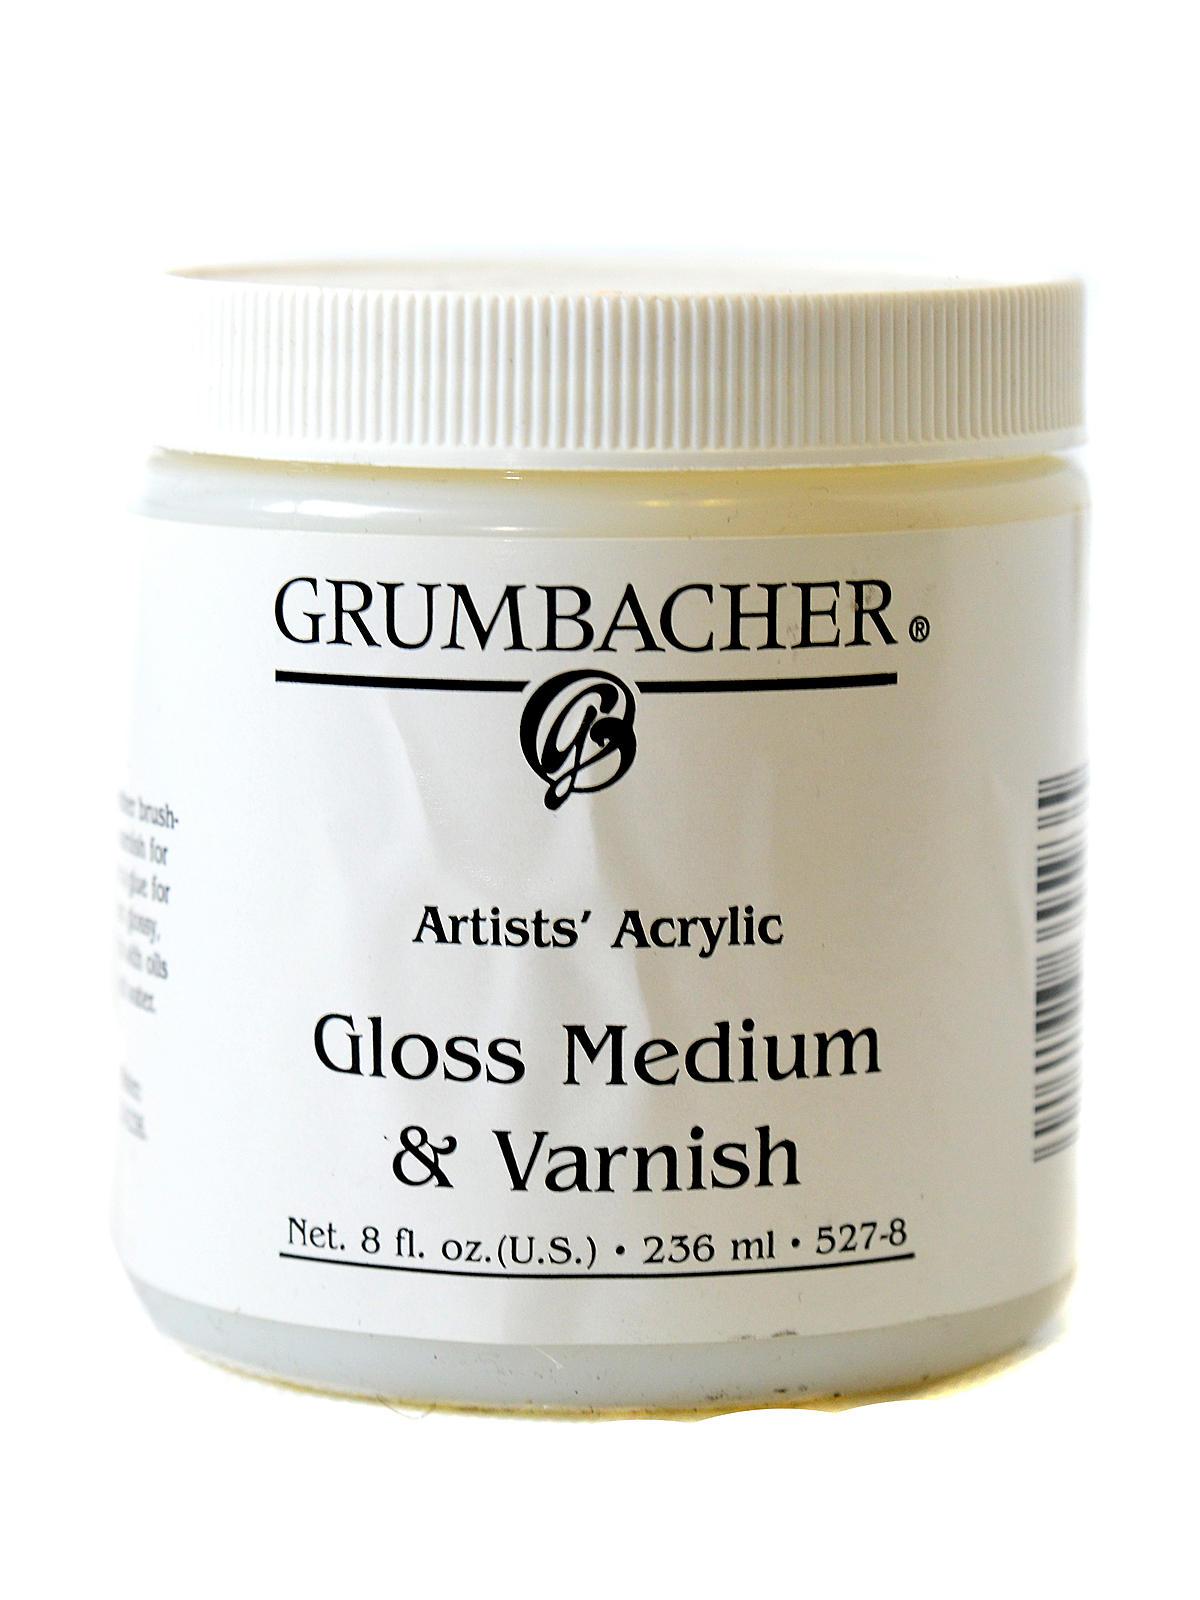 Grumbacher acrylic gloss medium varnish for Gloss medium for acrylic painting